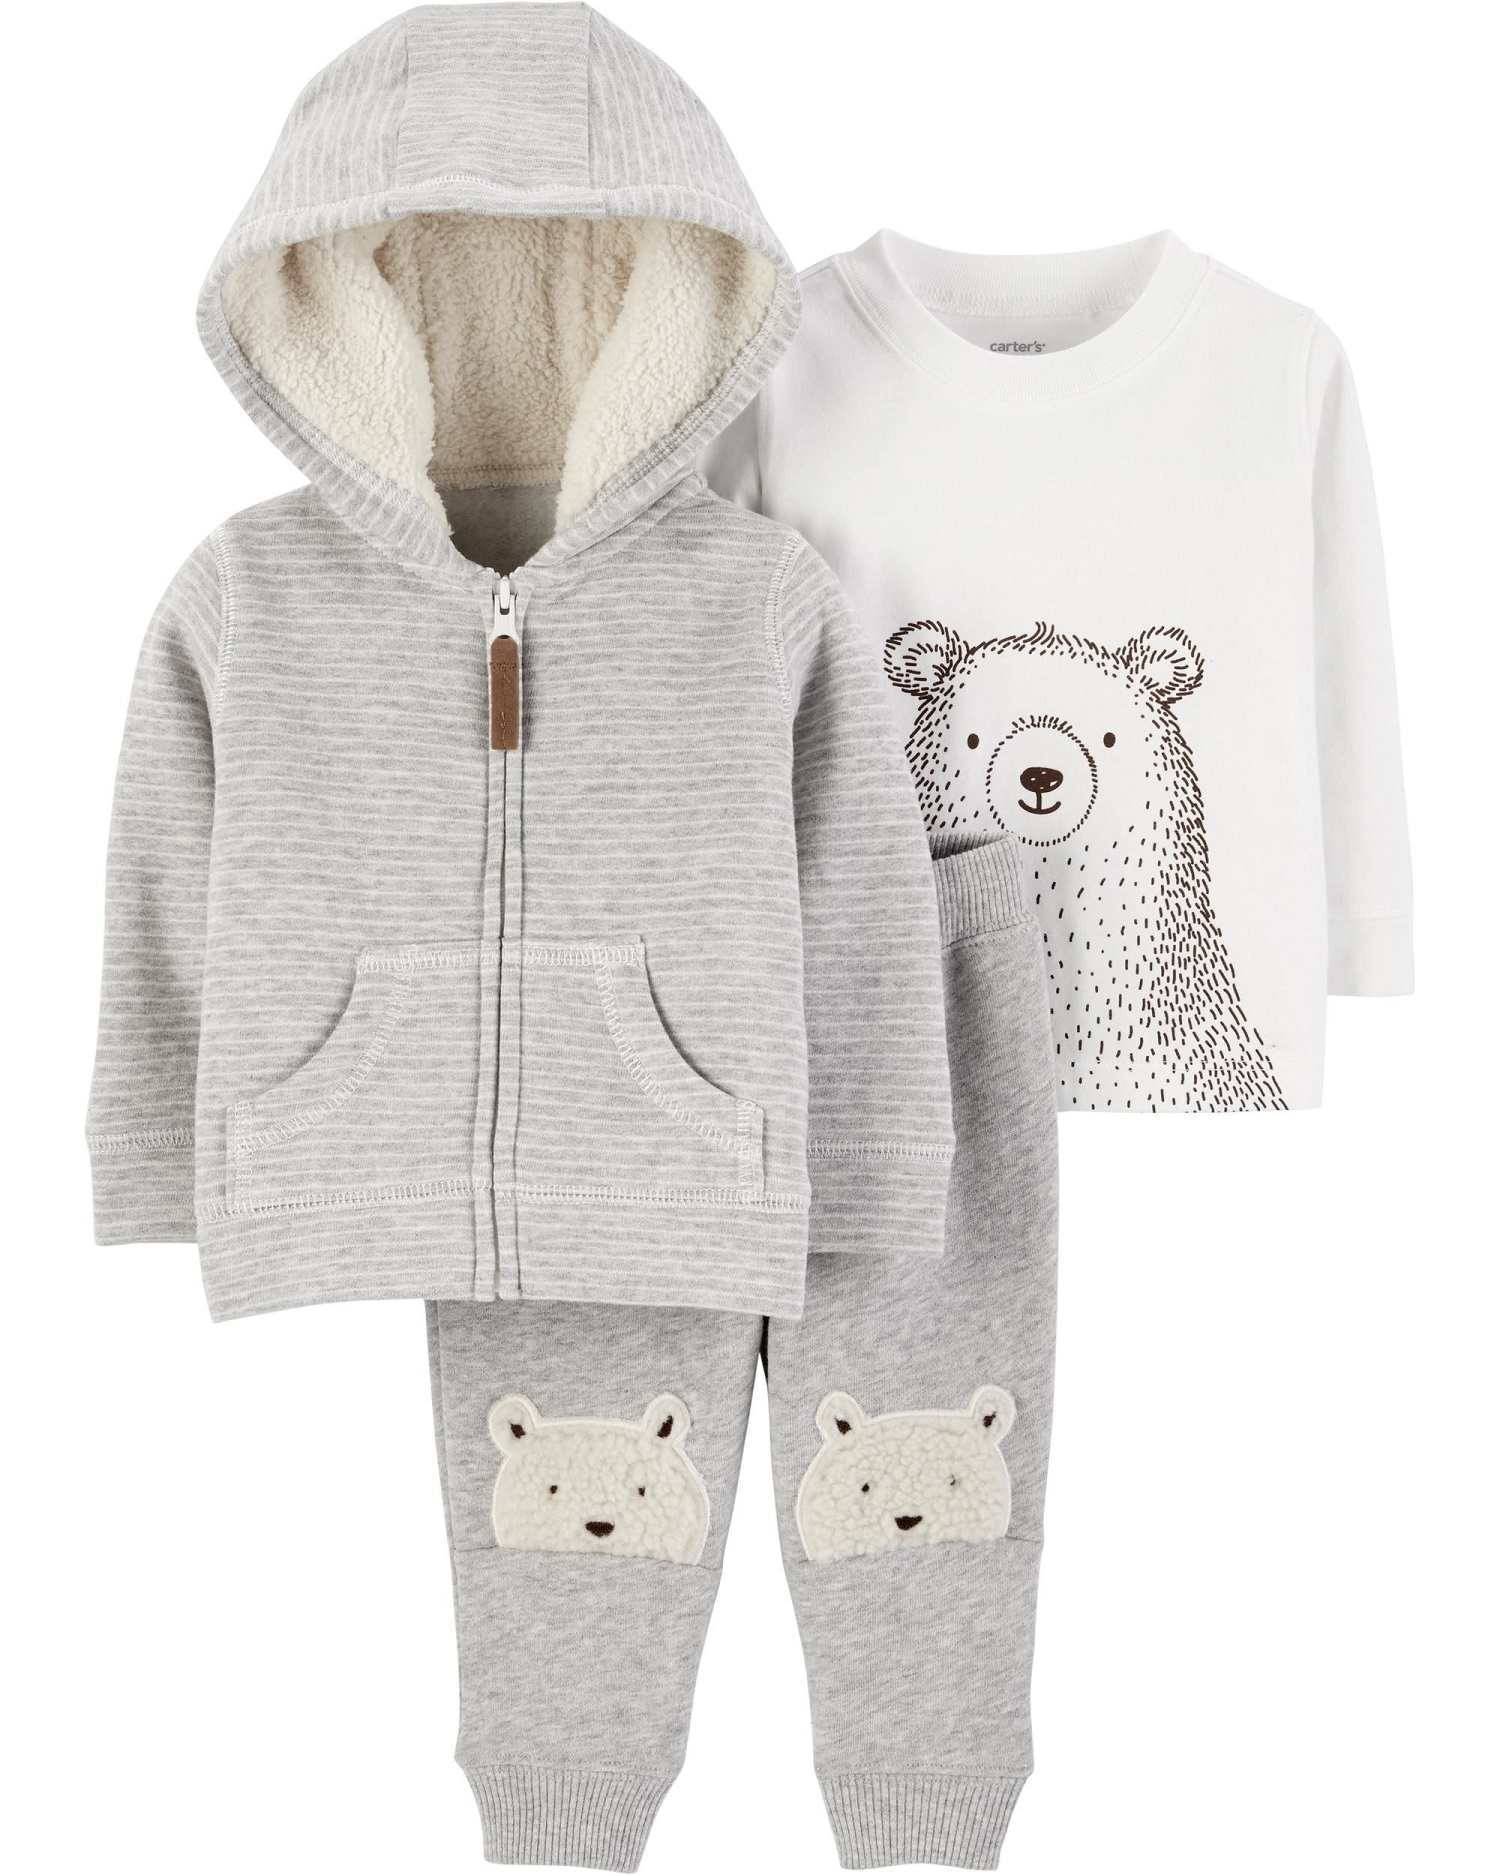 2566c8003 Carter s - Carter s Baby Boys  3-Piece Fleece Jacket Set